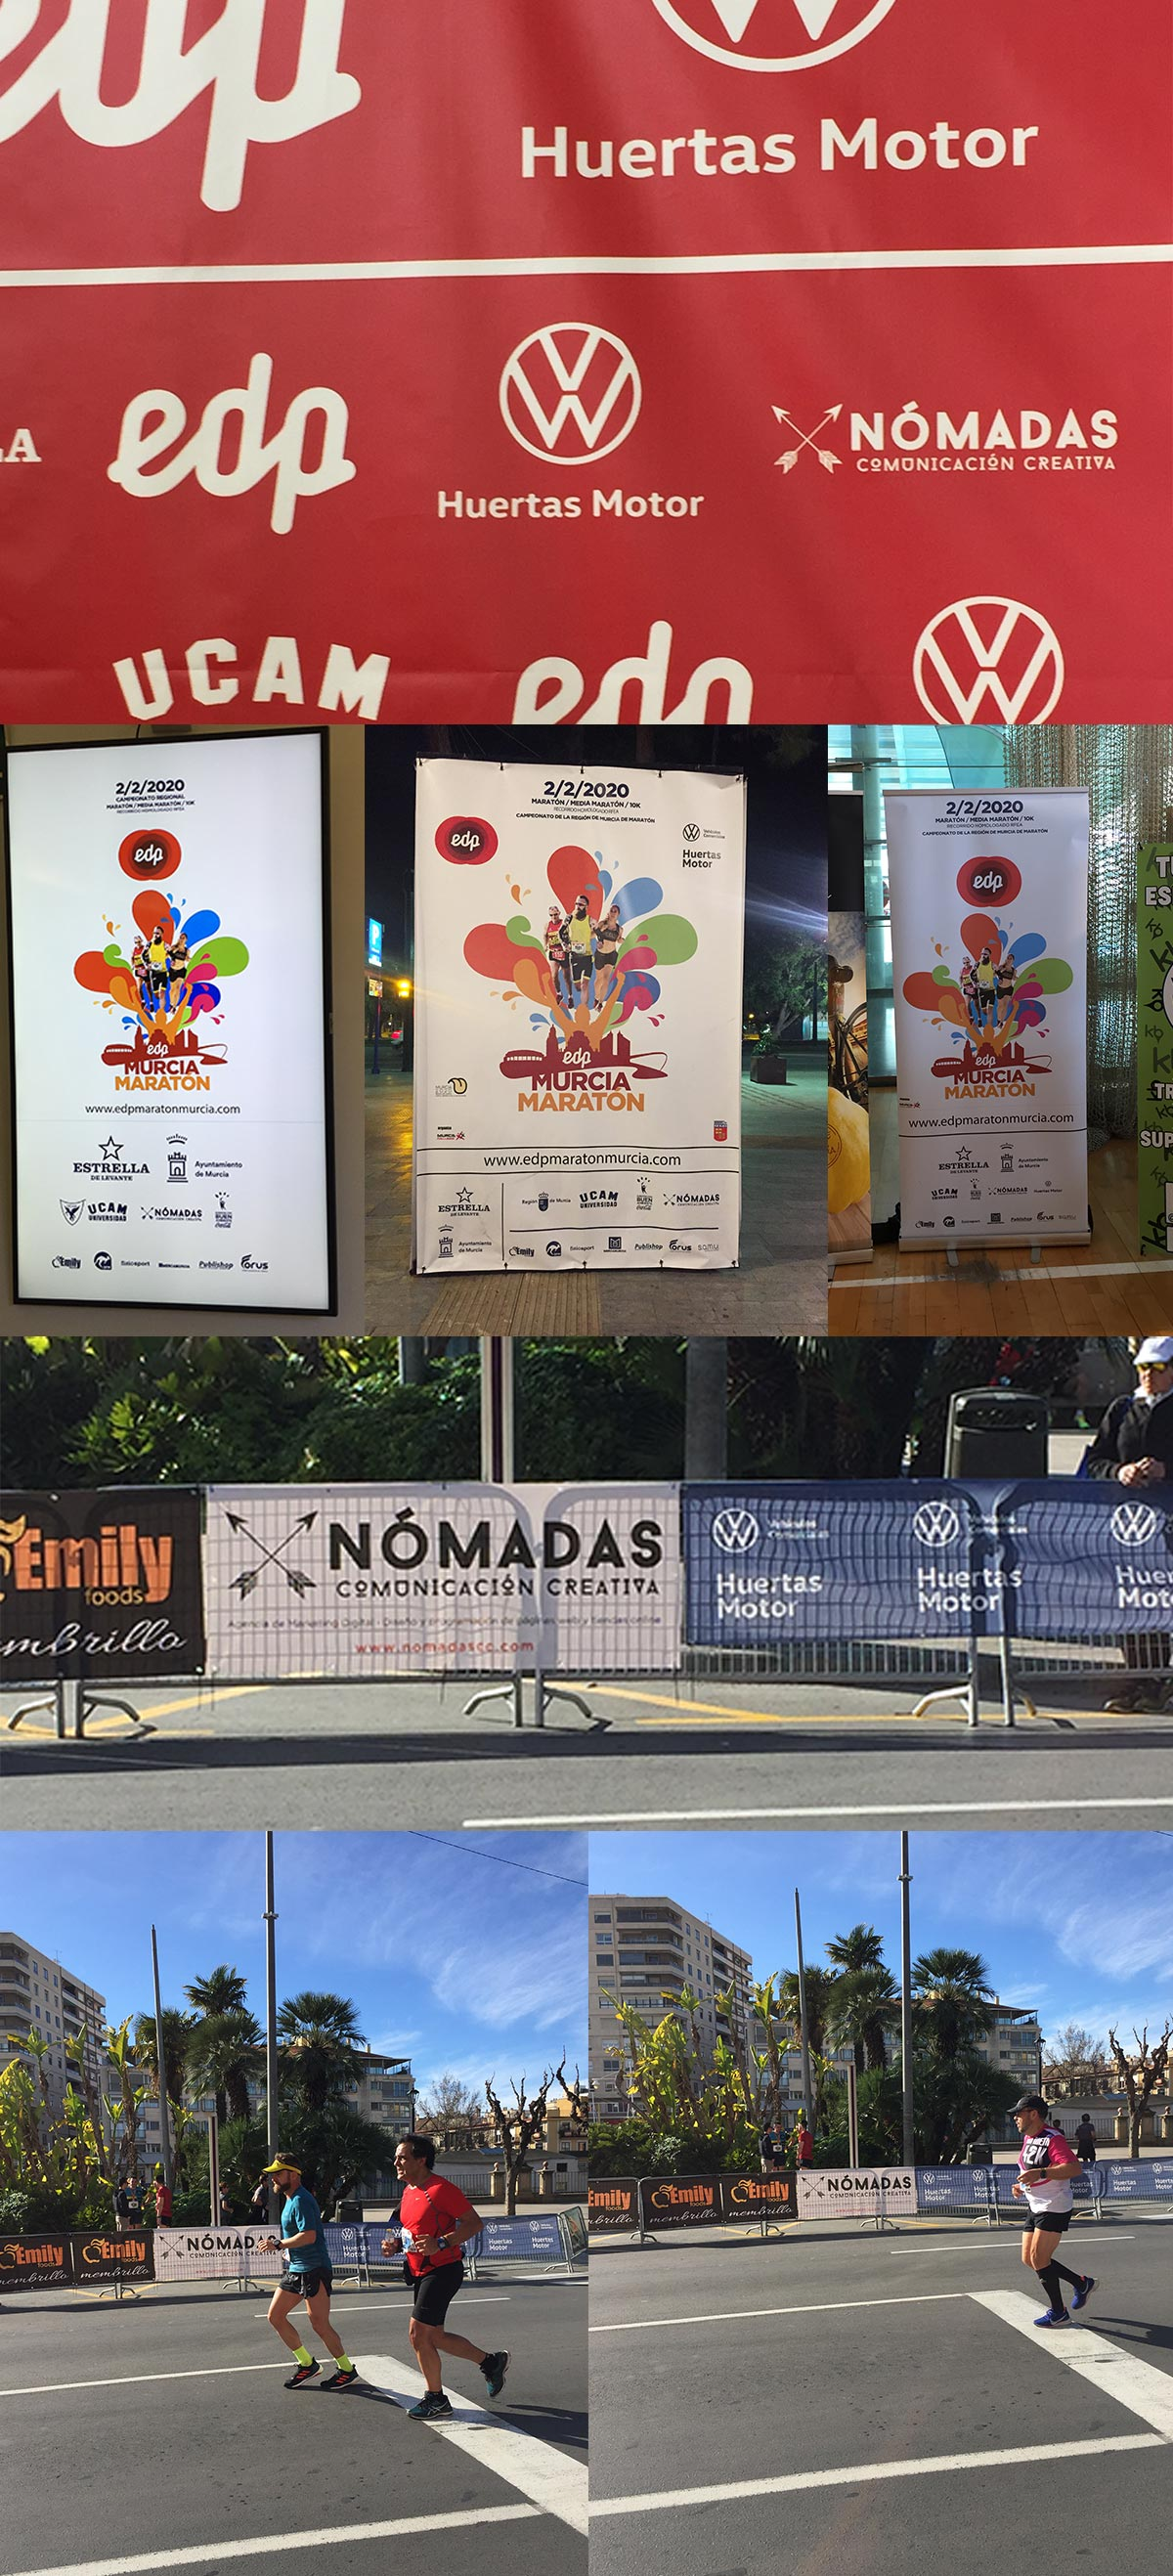 Patrocinador de la EDP Murcia Maratón. Agencia de Marketing Digital en Murcia | Nómadas Comunicación Creativa.